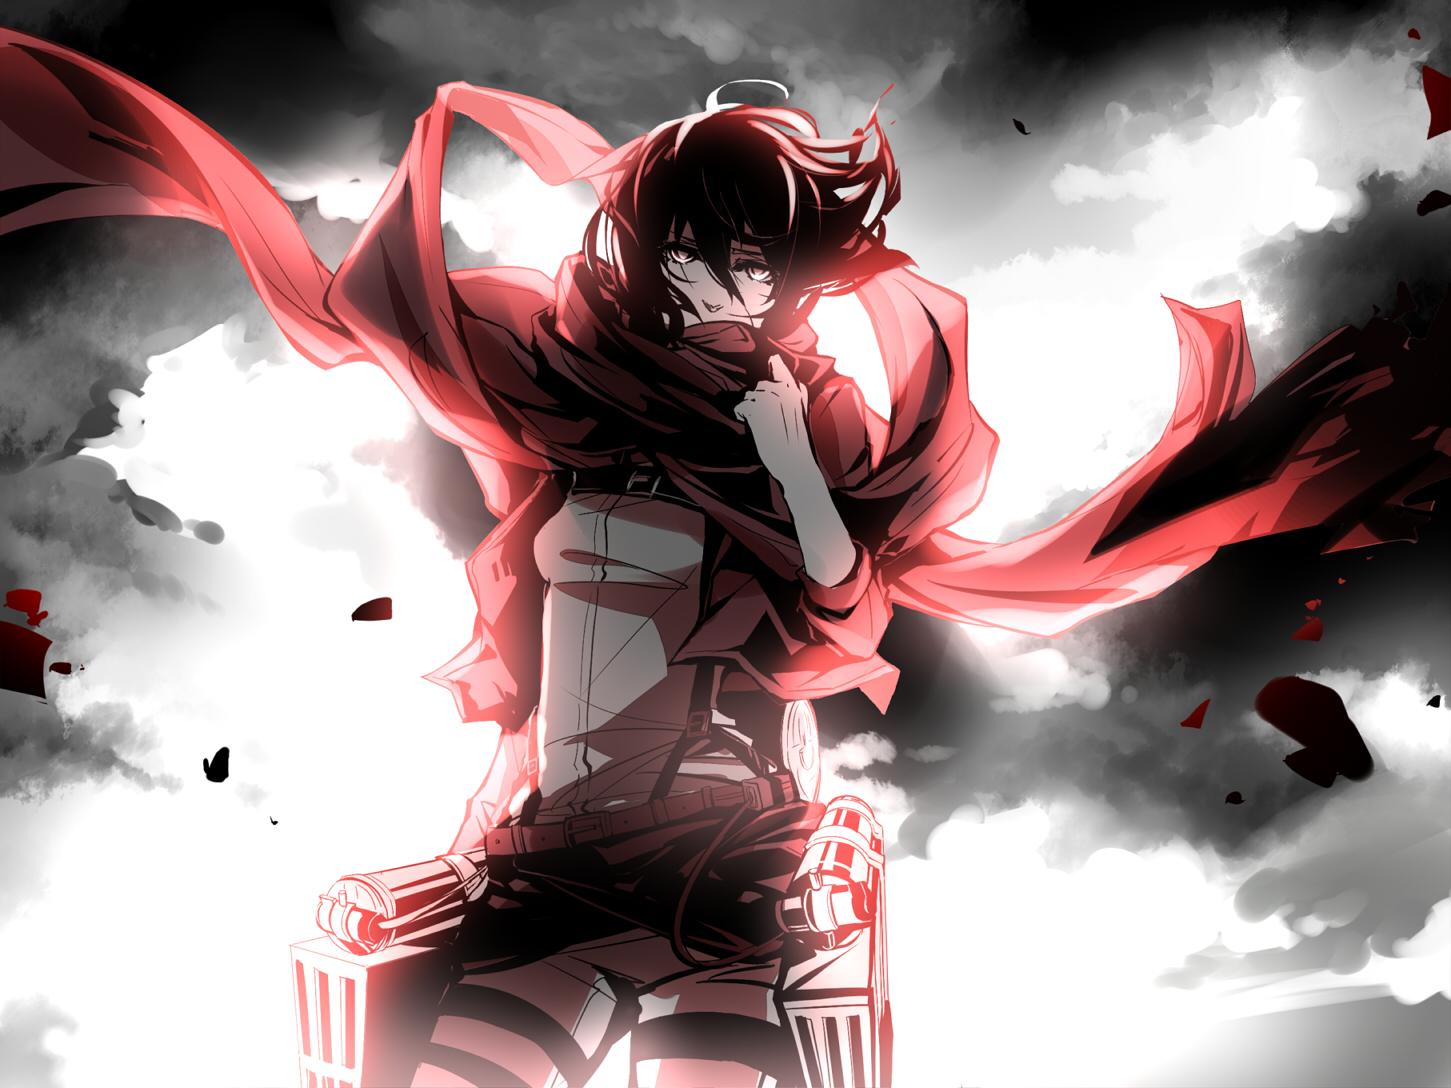 Shingeki No Kyojin Season 2 Episode 1 20 Cool Hd Wallpaper